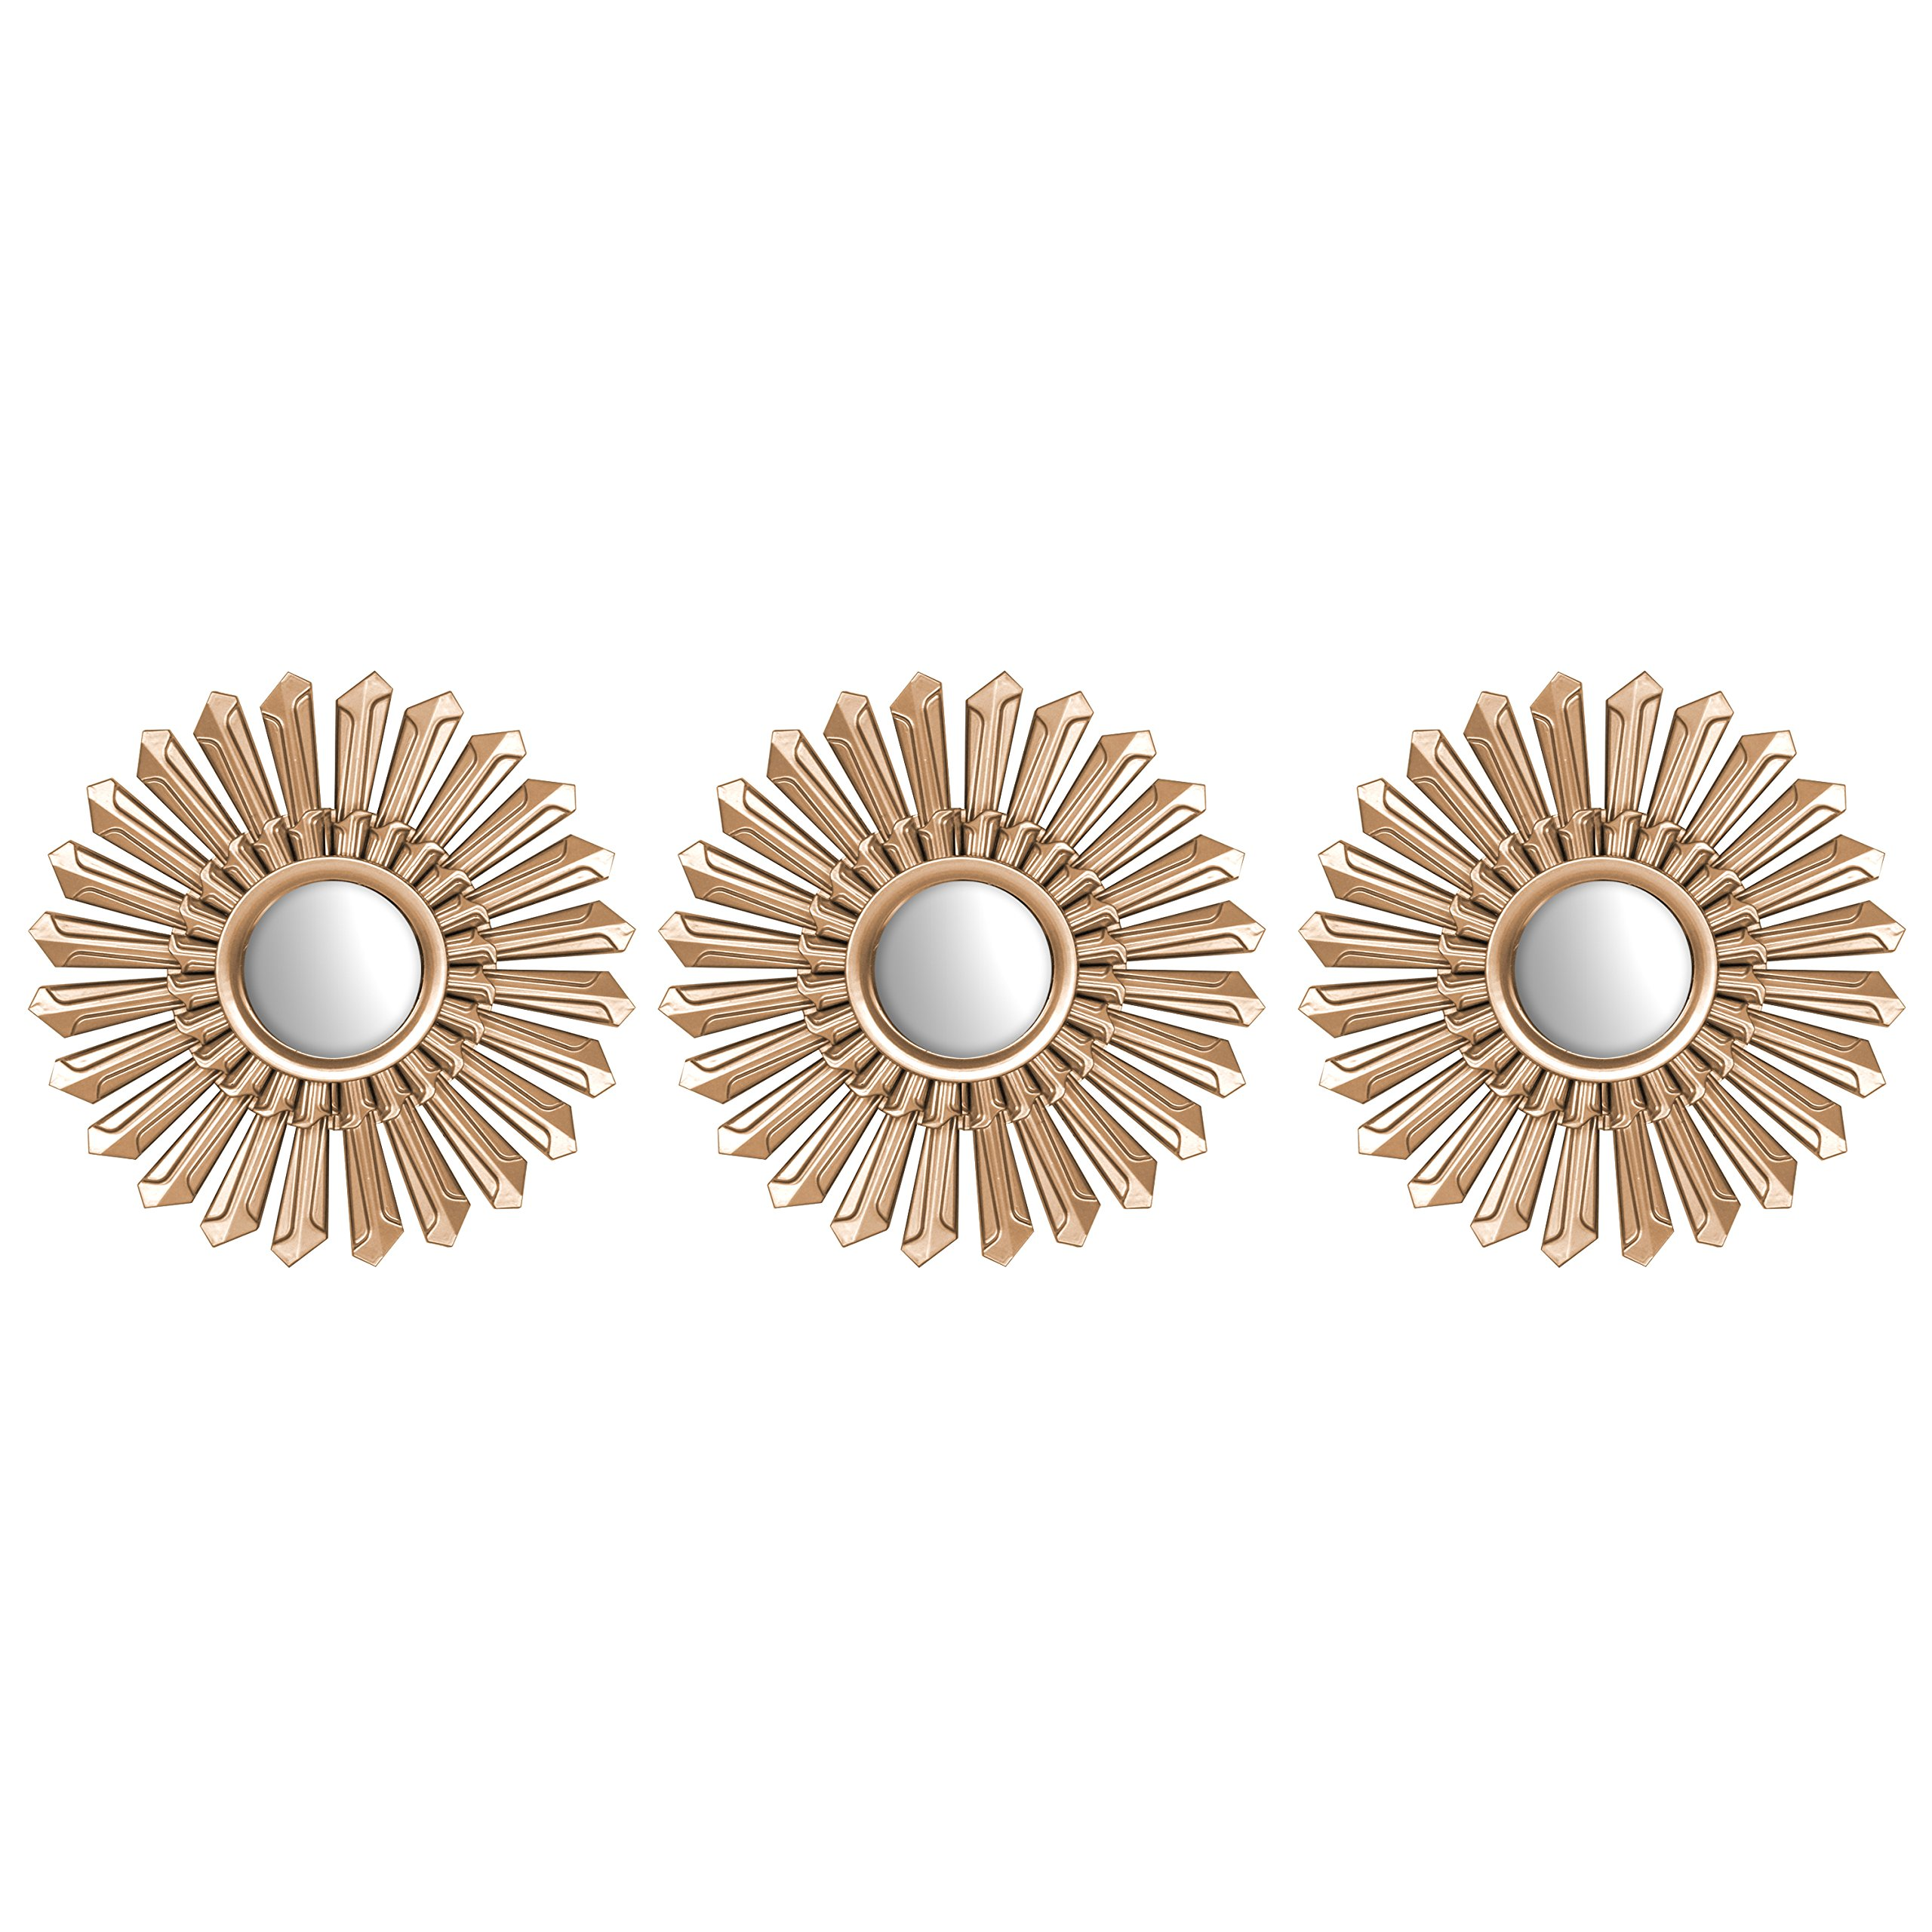 Urban Shop 784857762303 Metallic Mirror, Bronze